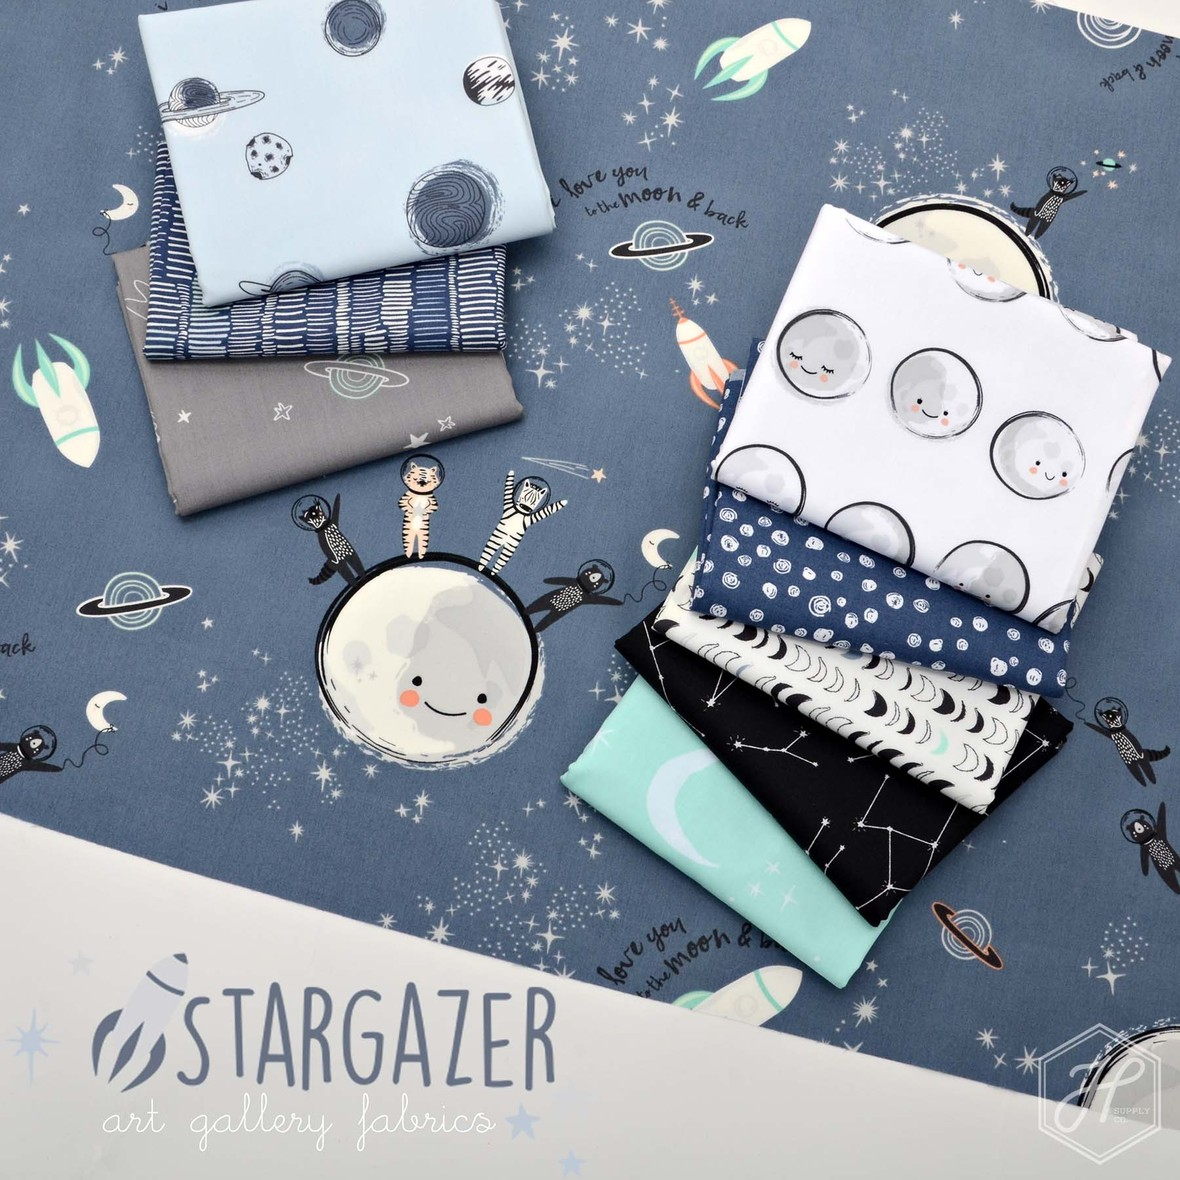 Stargazer Capsules Art Gallery at Hawthorne Supply rescaled